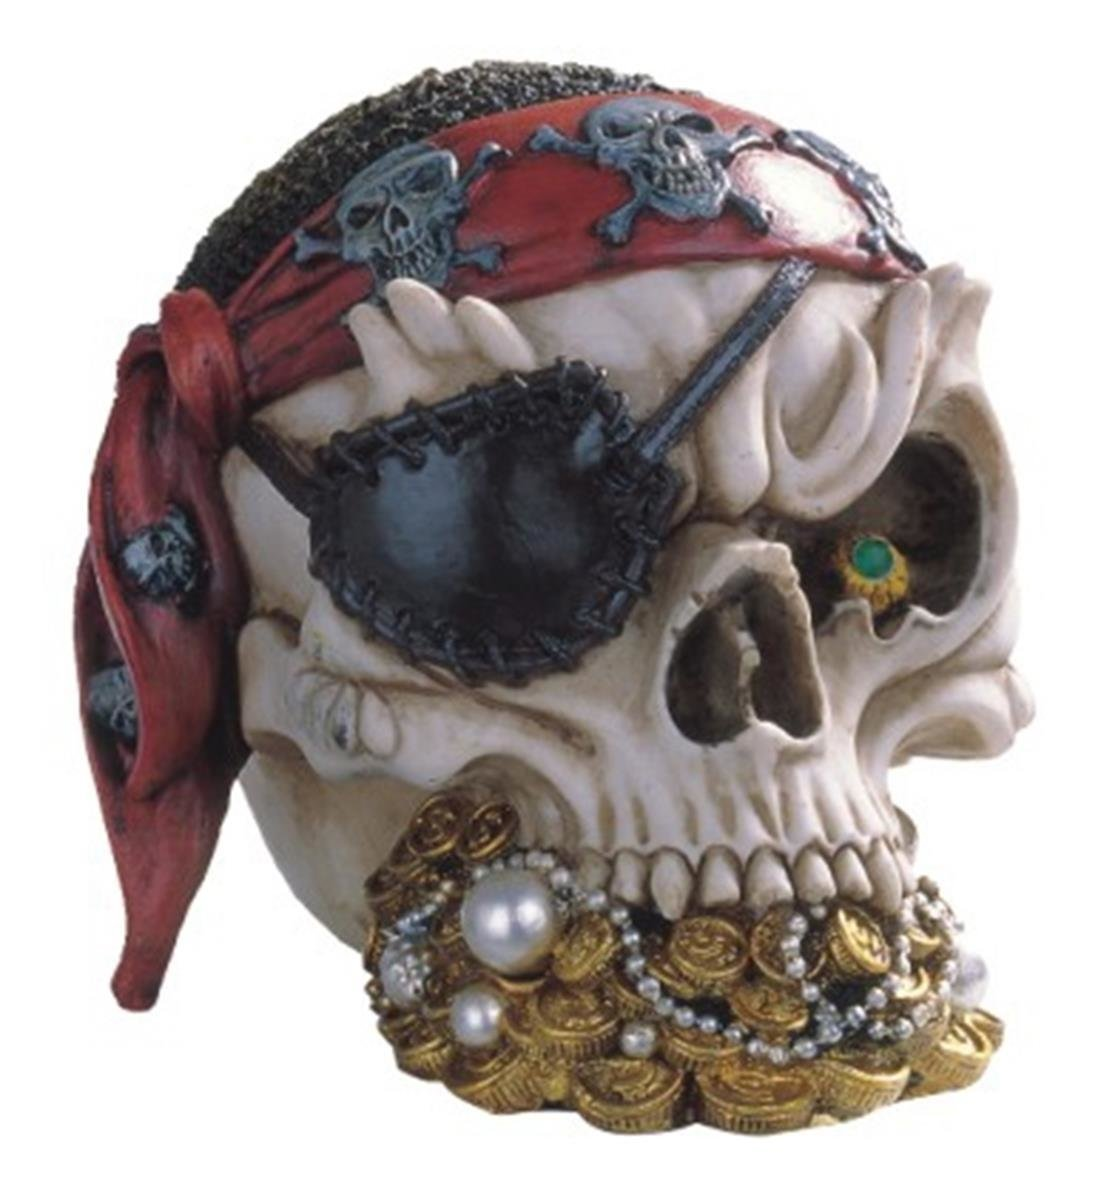 Pirate Skull Head With Treasure Collectible Figurine Statue Decoration